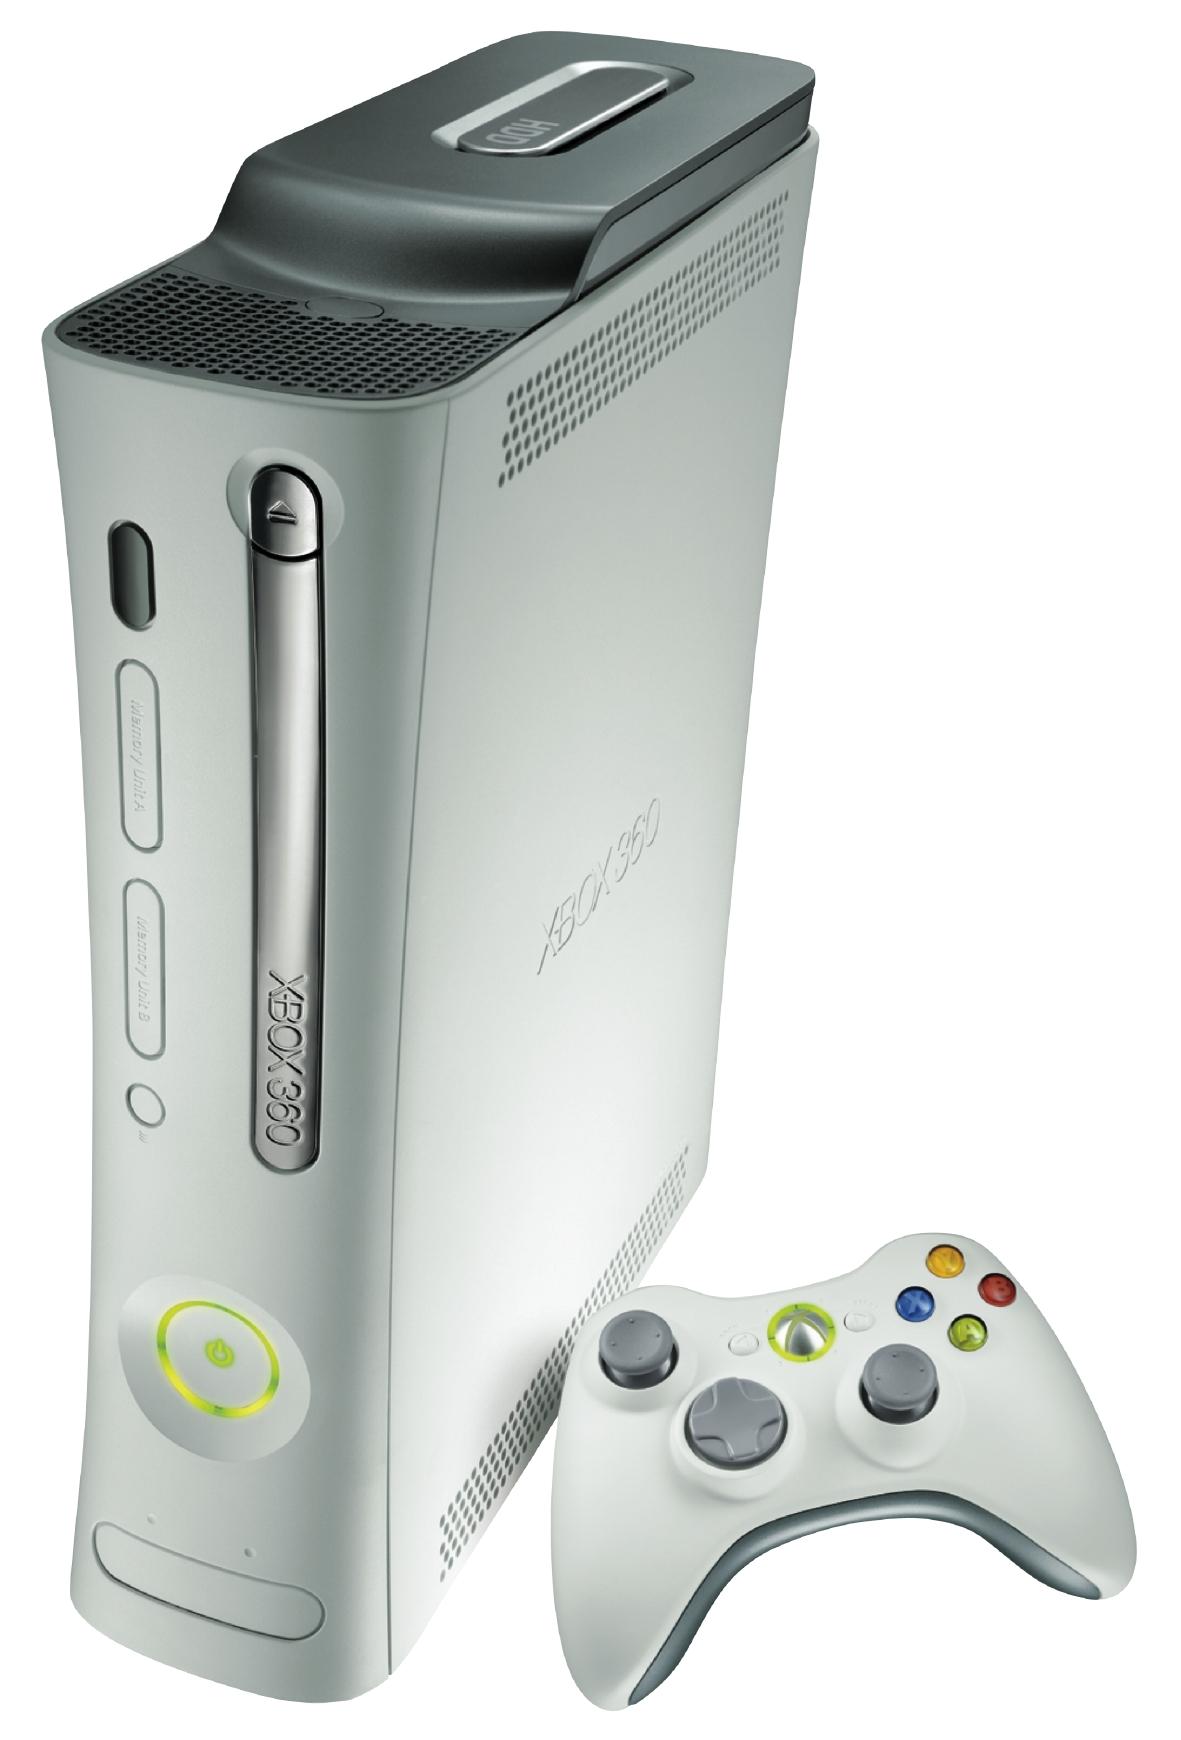 Buy a Microsoft XBox 360